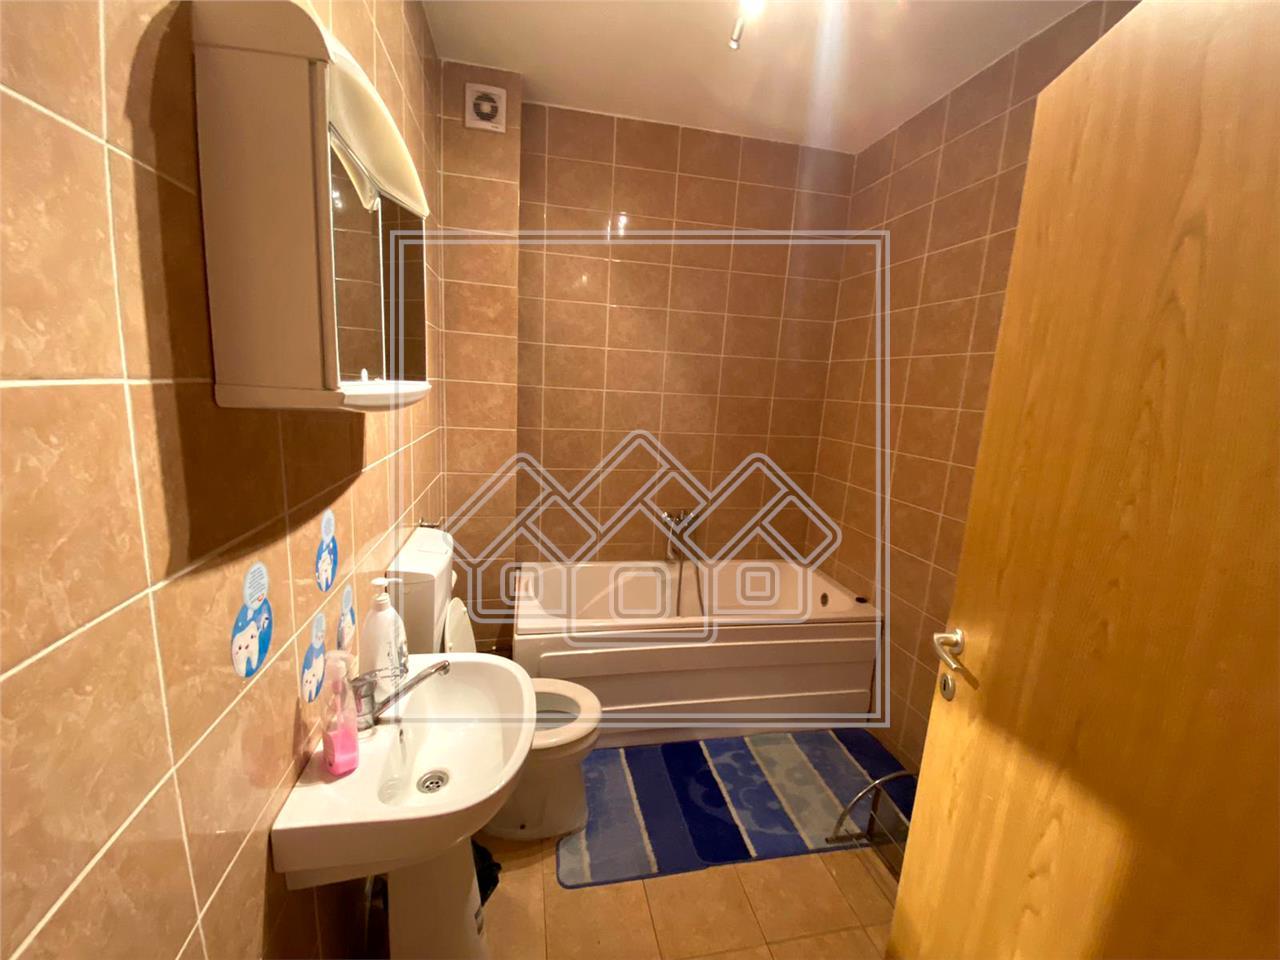 Apartament de inchiriat in Sibiu - Selimbar - mobilat si utilat